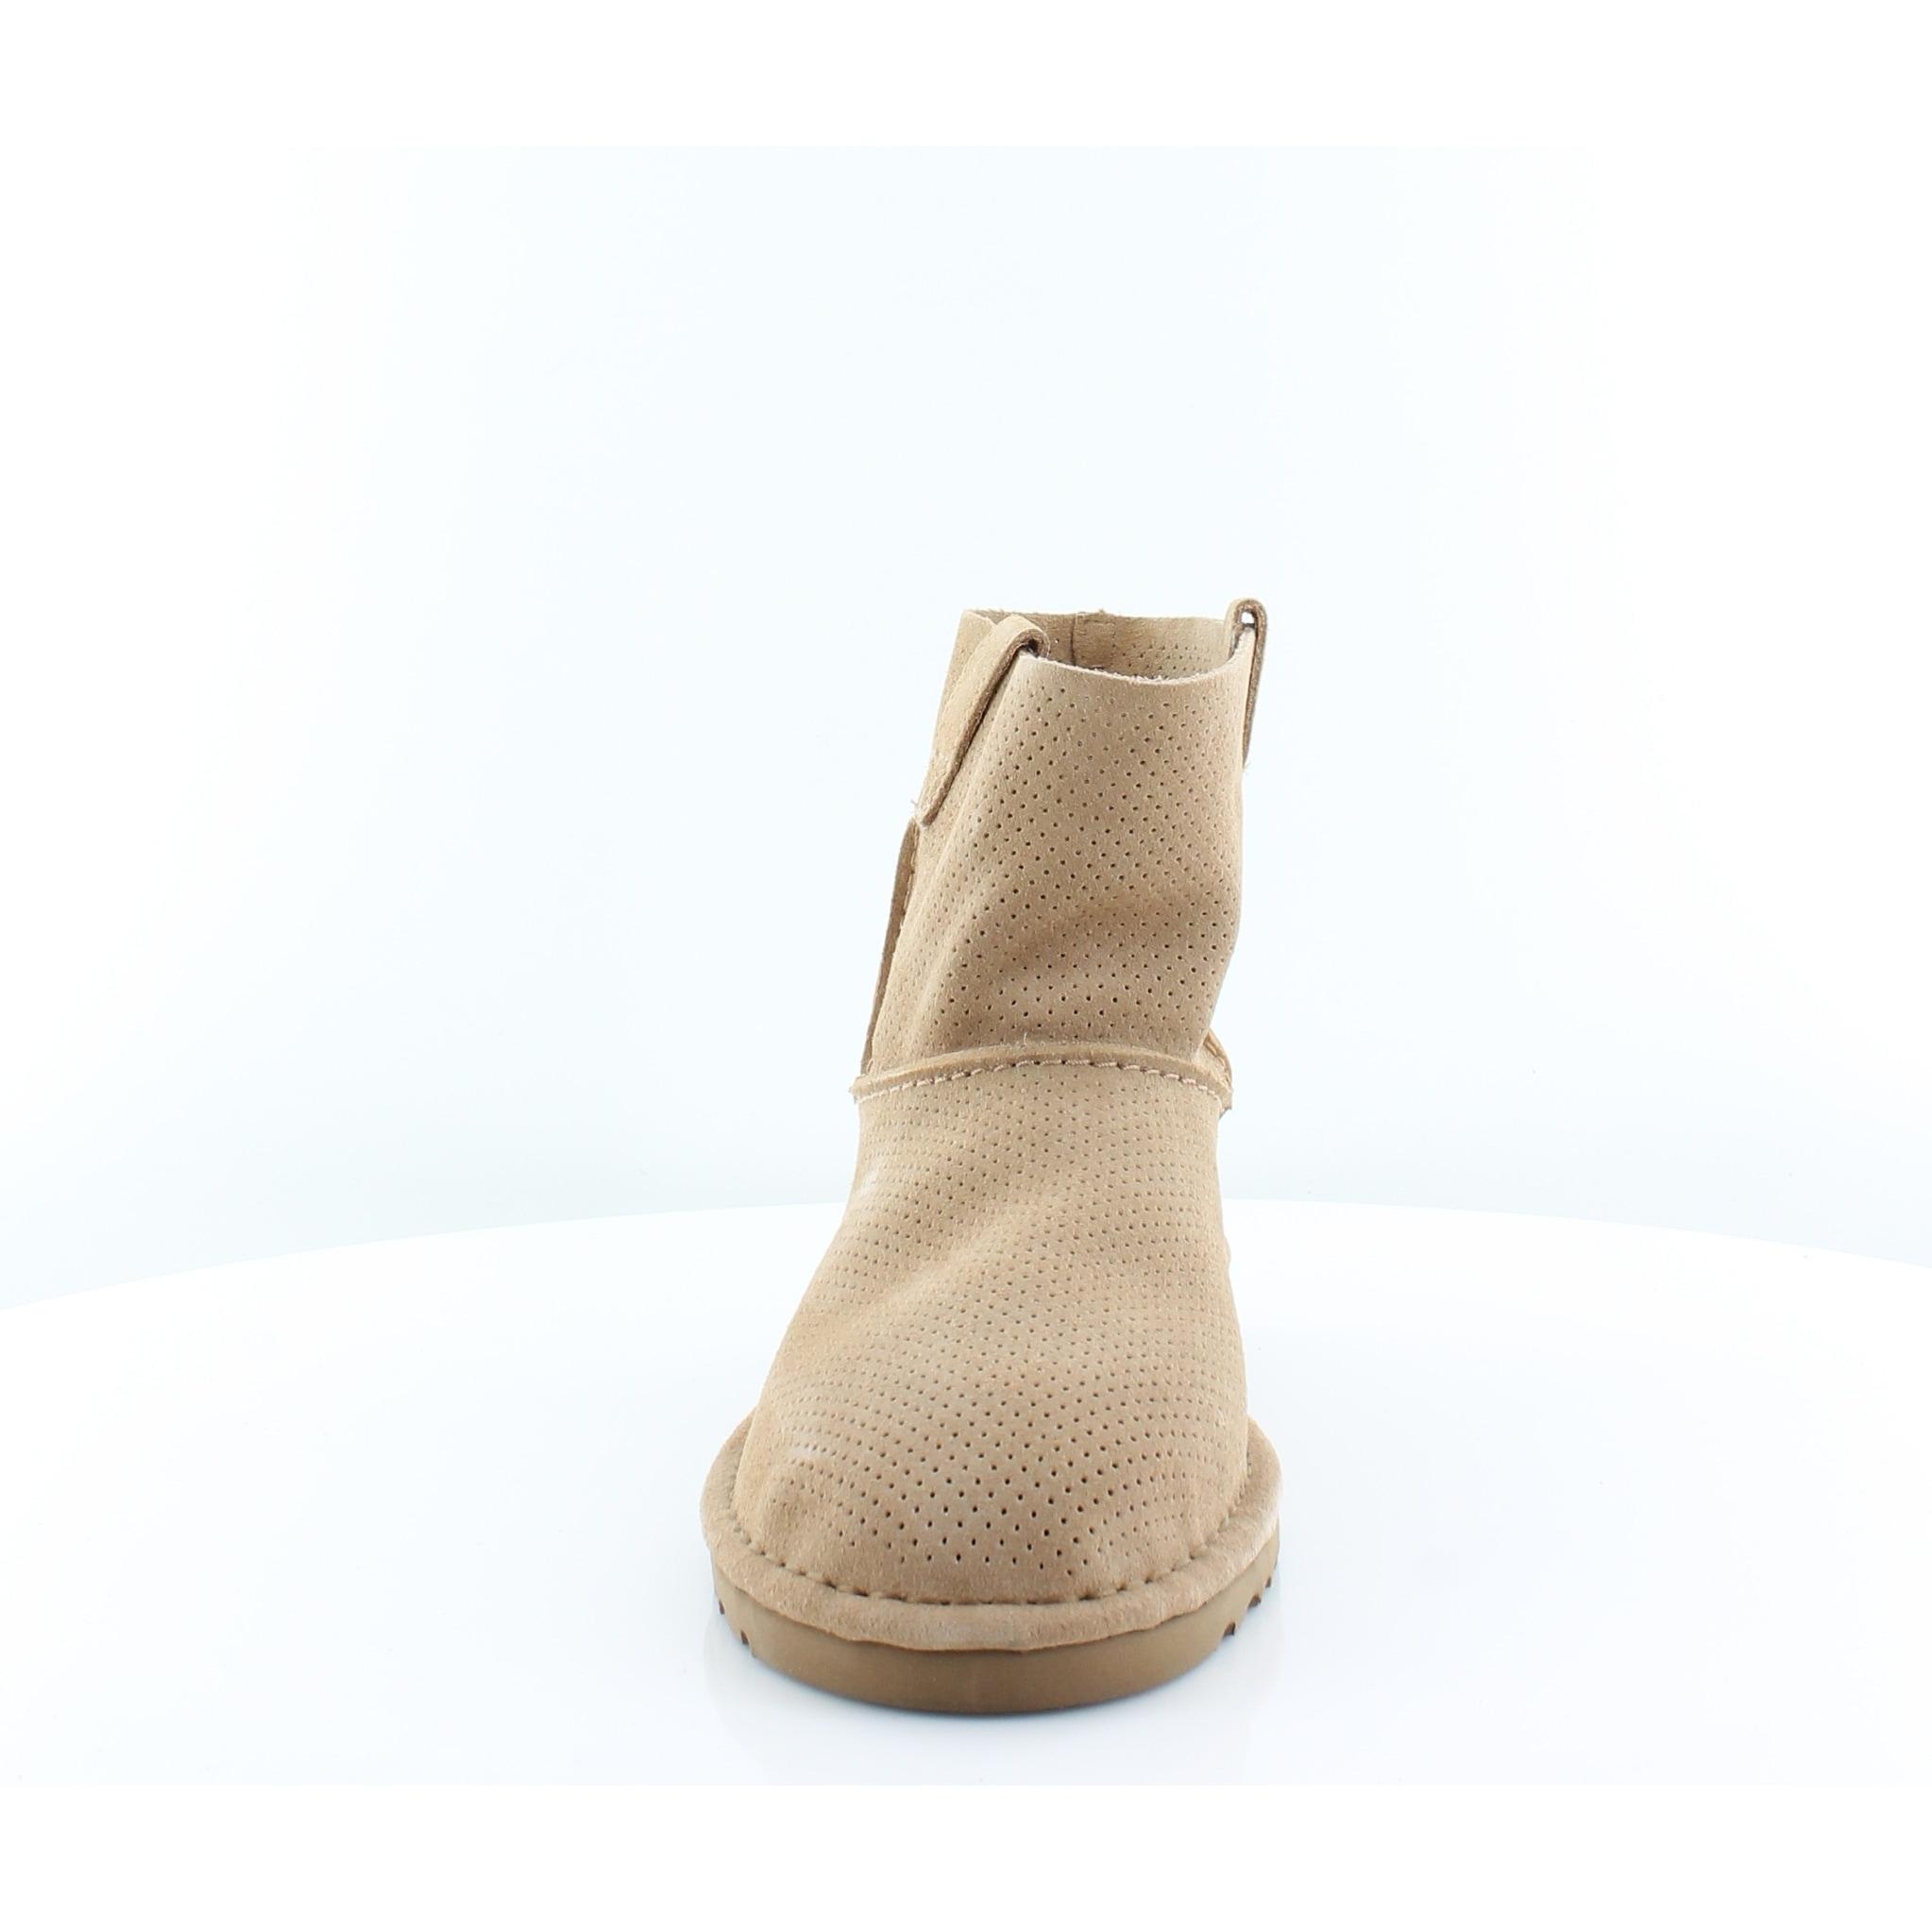 de96c12225d UGG Unlined Mini Women's Boots 1016852 W/Taw